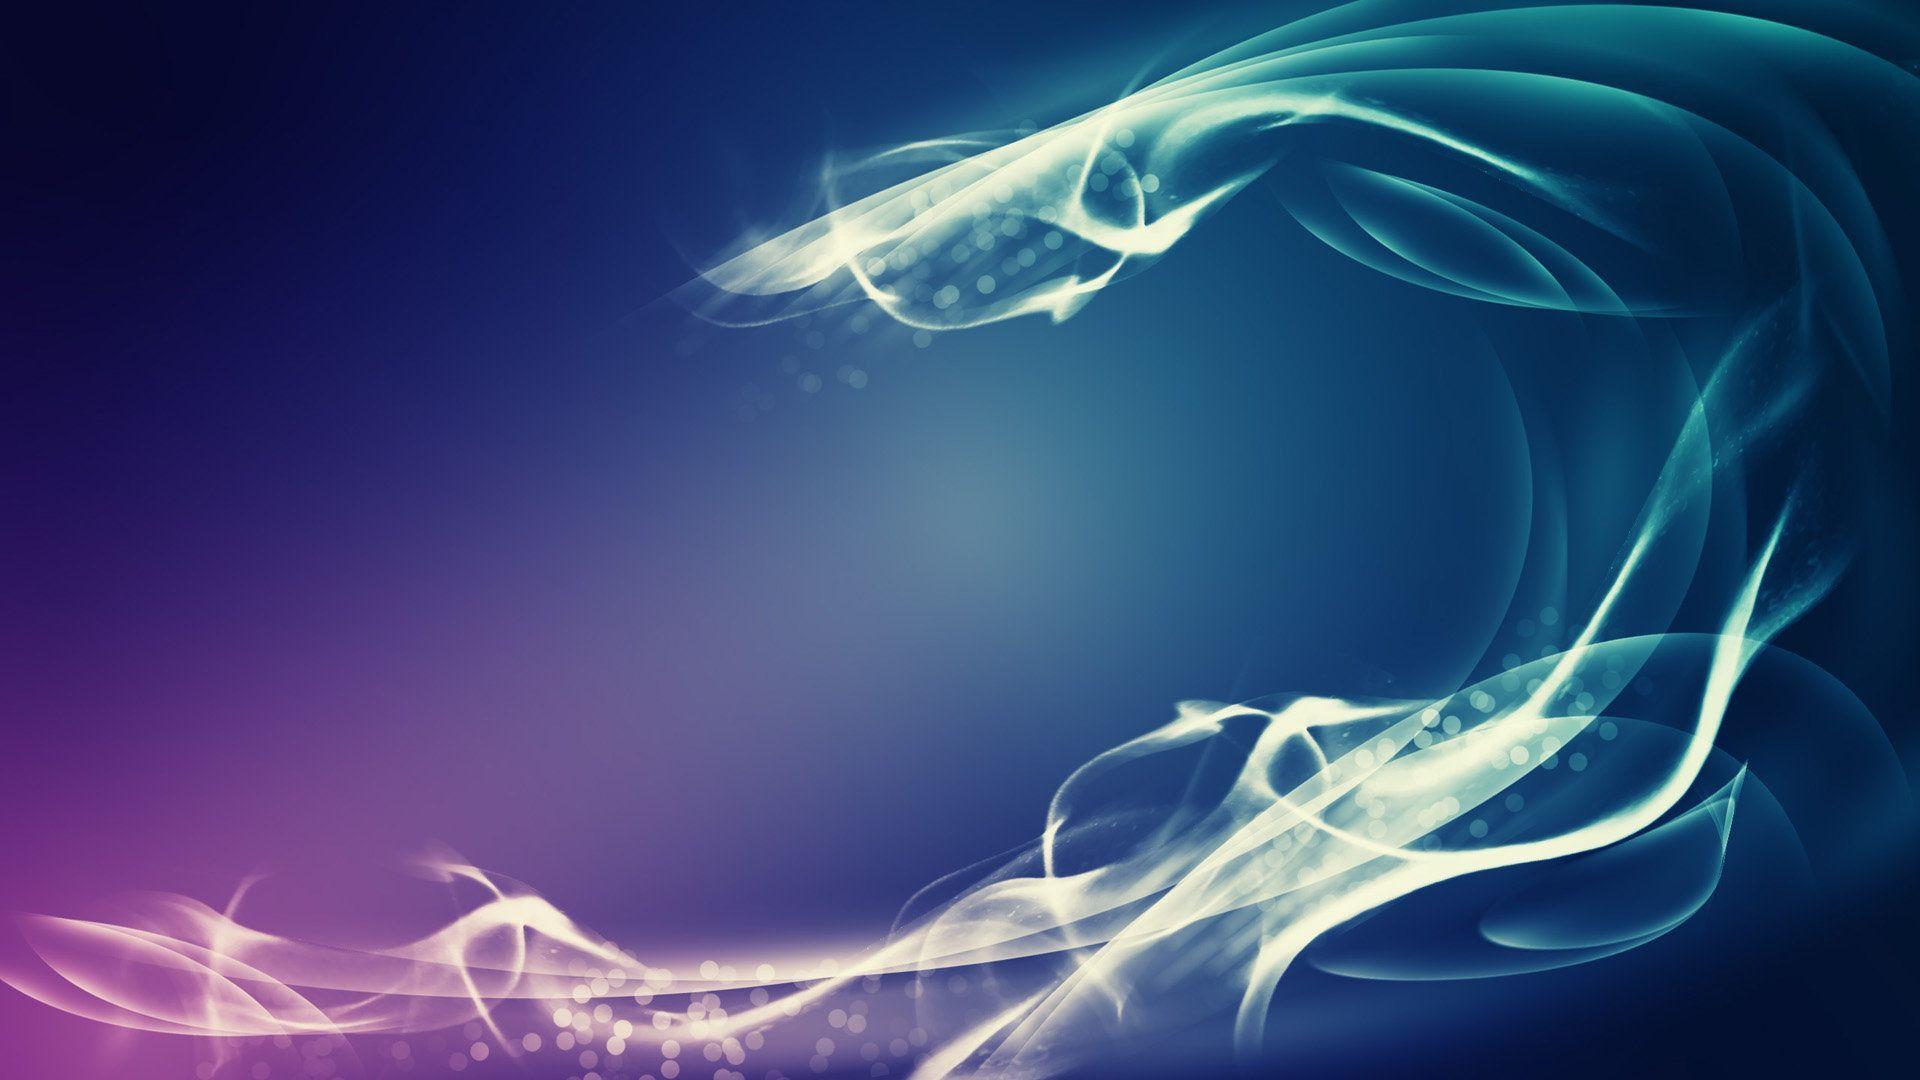 blue abstract wallpaper - sf wallpaper